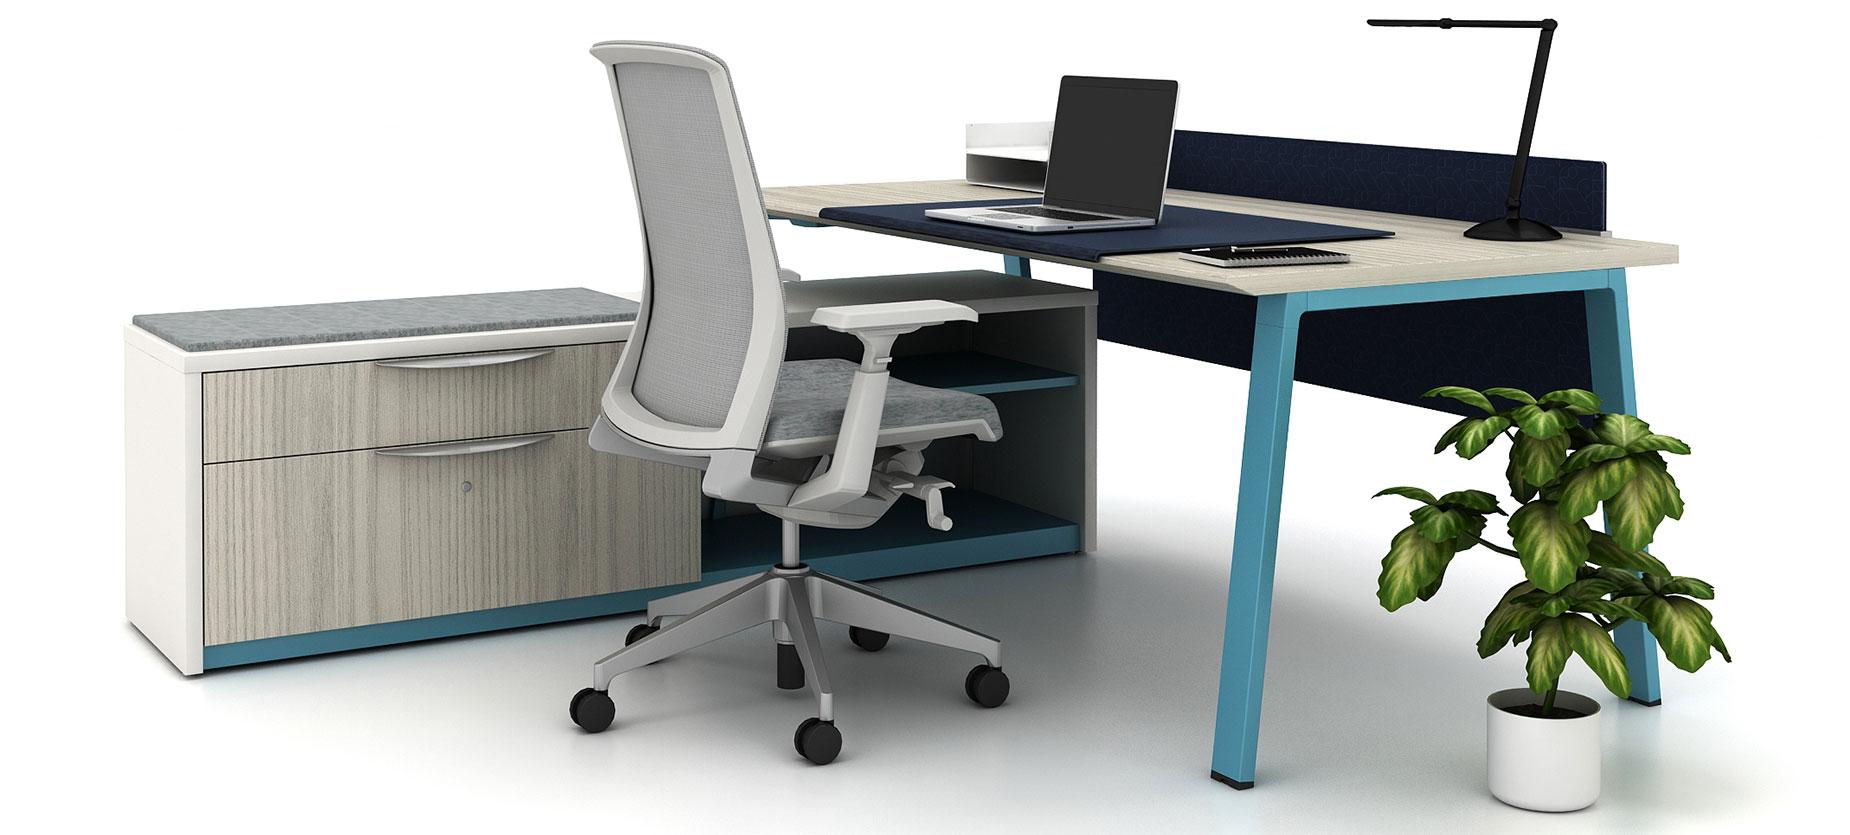 Individual Workspace